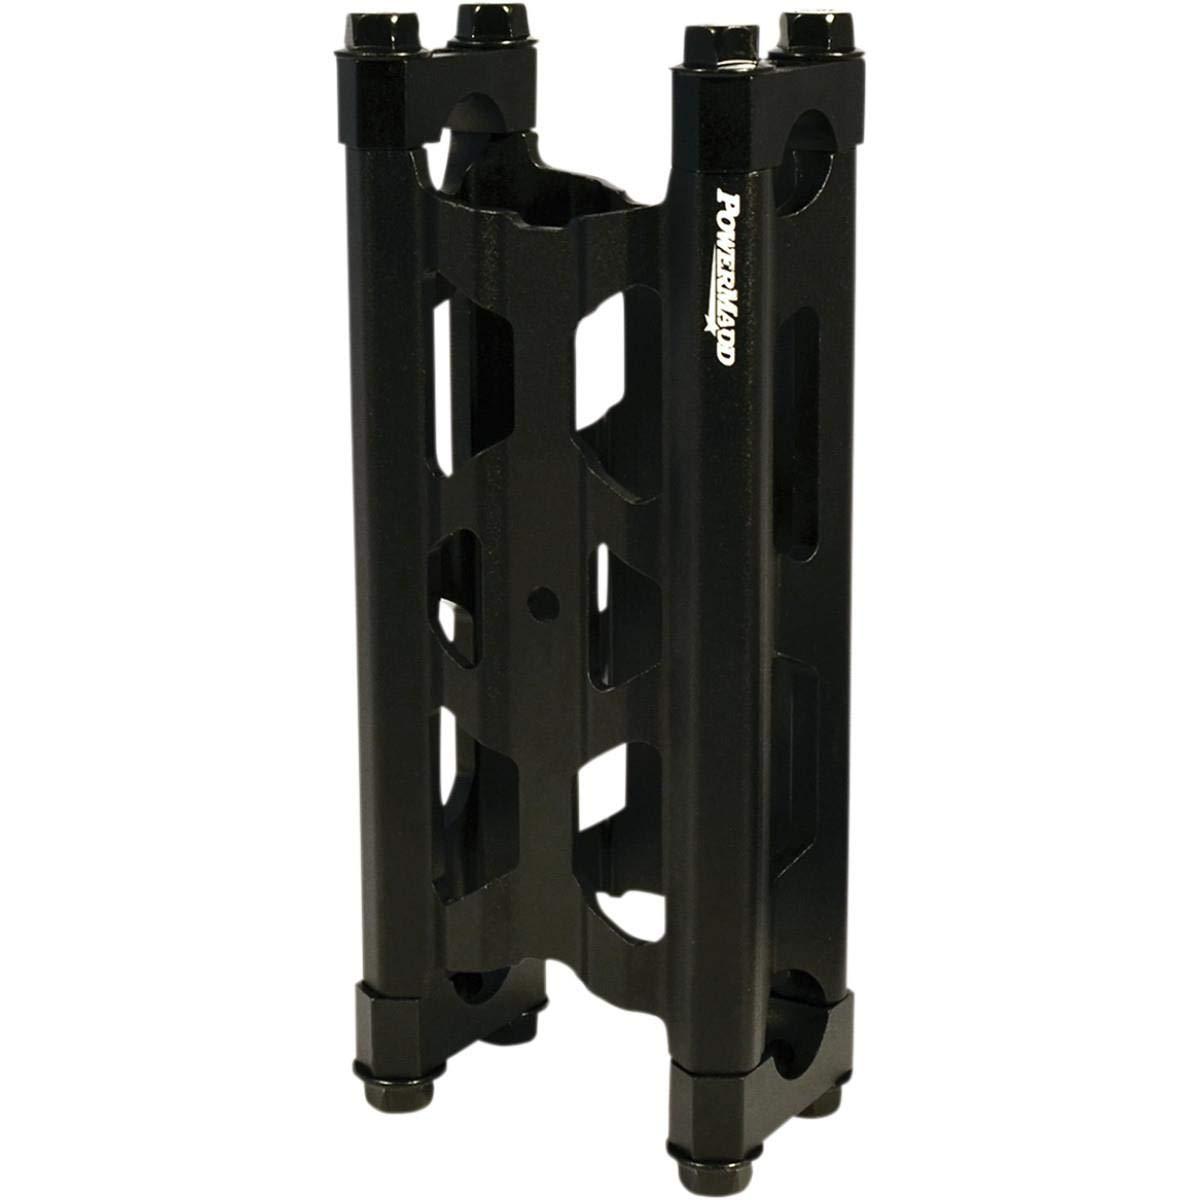 bike GP handlebar risers//Height up Adapters for Kawasaki Z900RS 2018